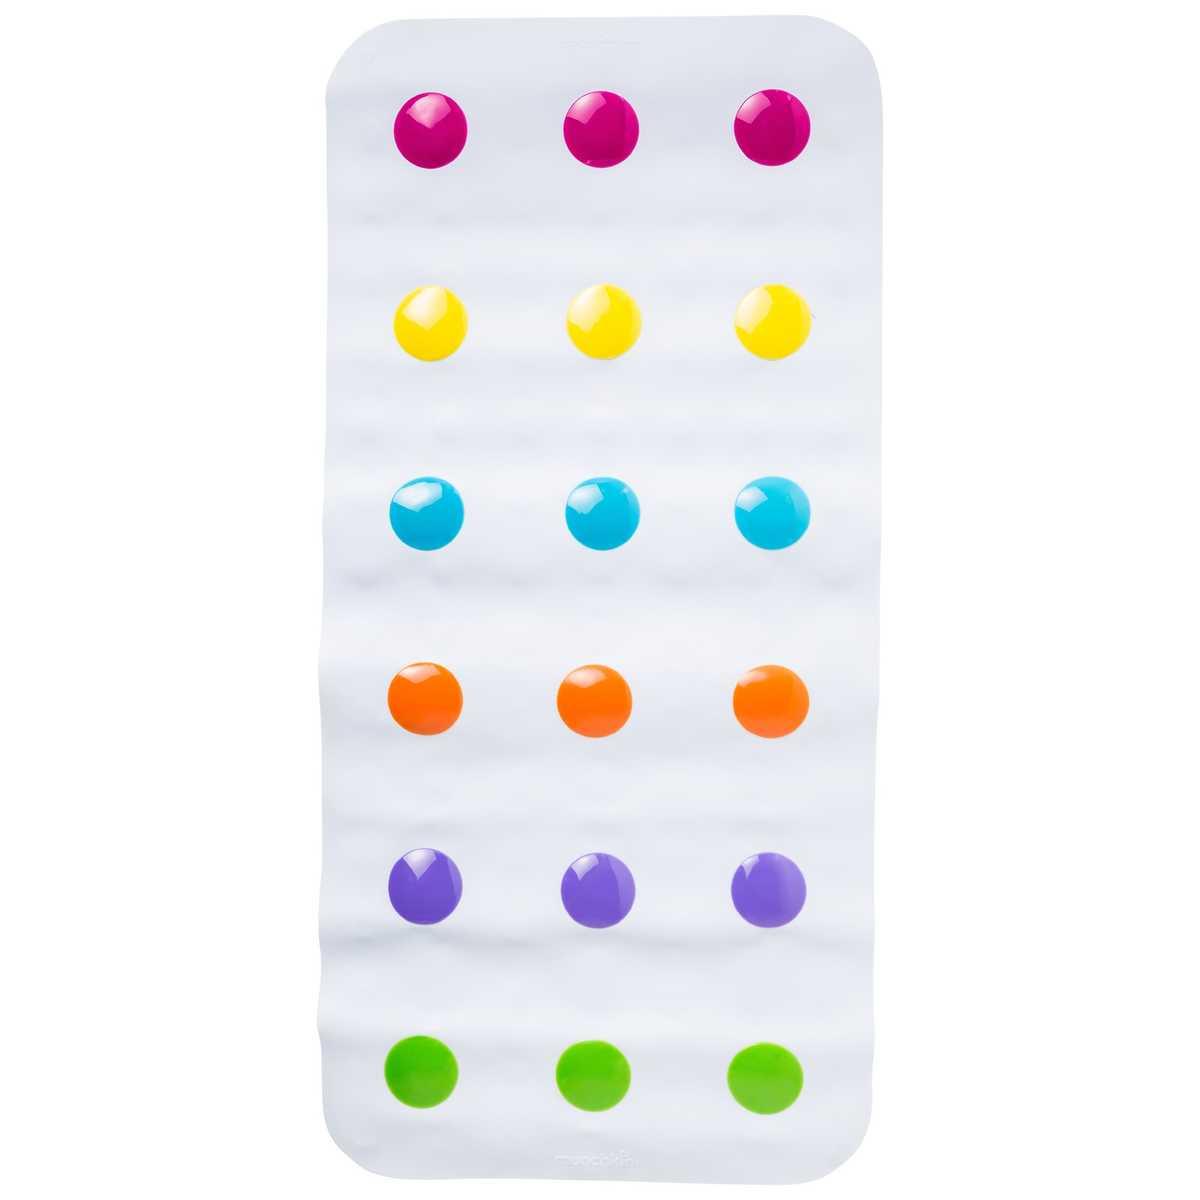 Munchkin Children Bathtime Safety Non-Slip Dandy Dots Toddler Bath Colourful Mat